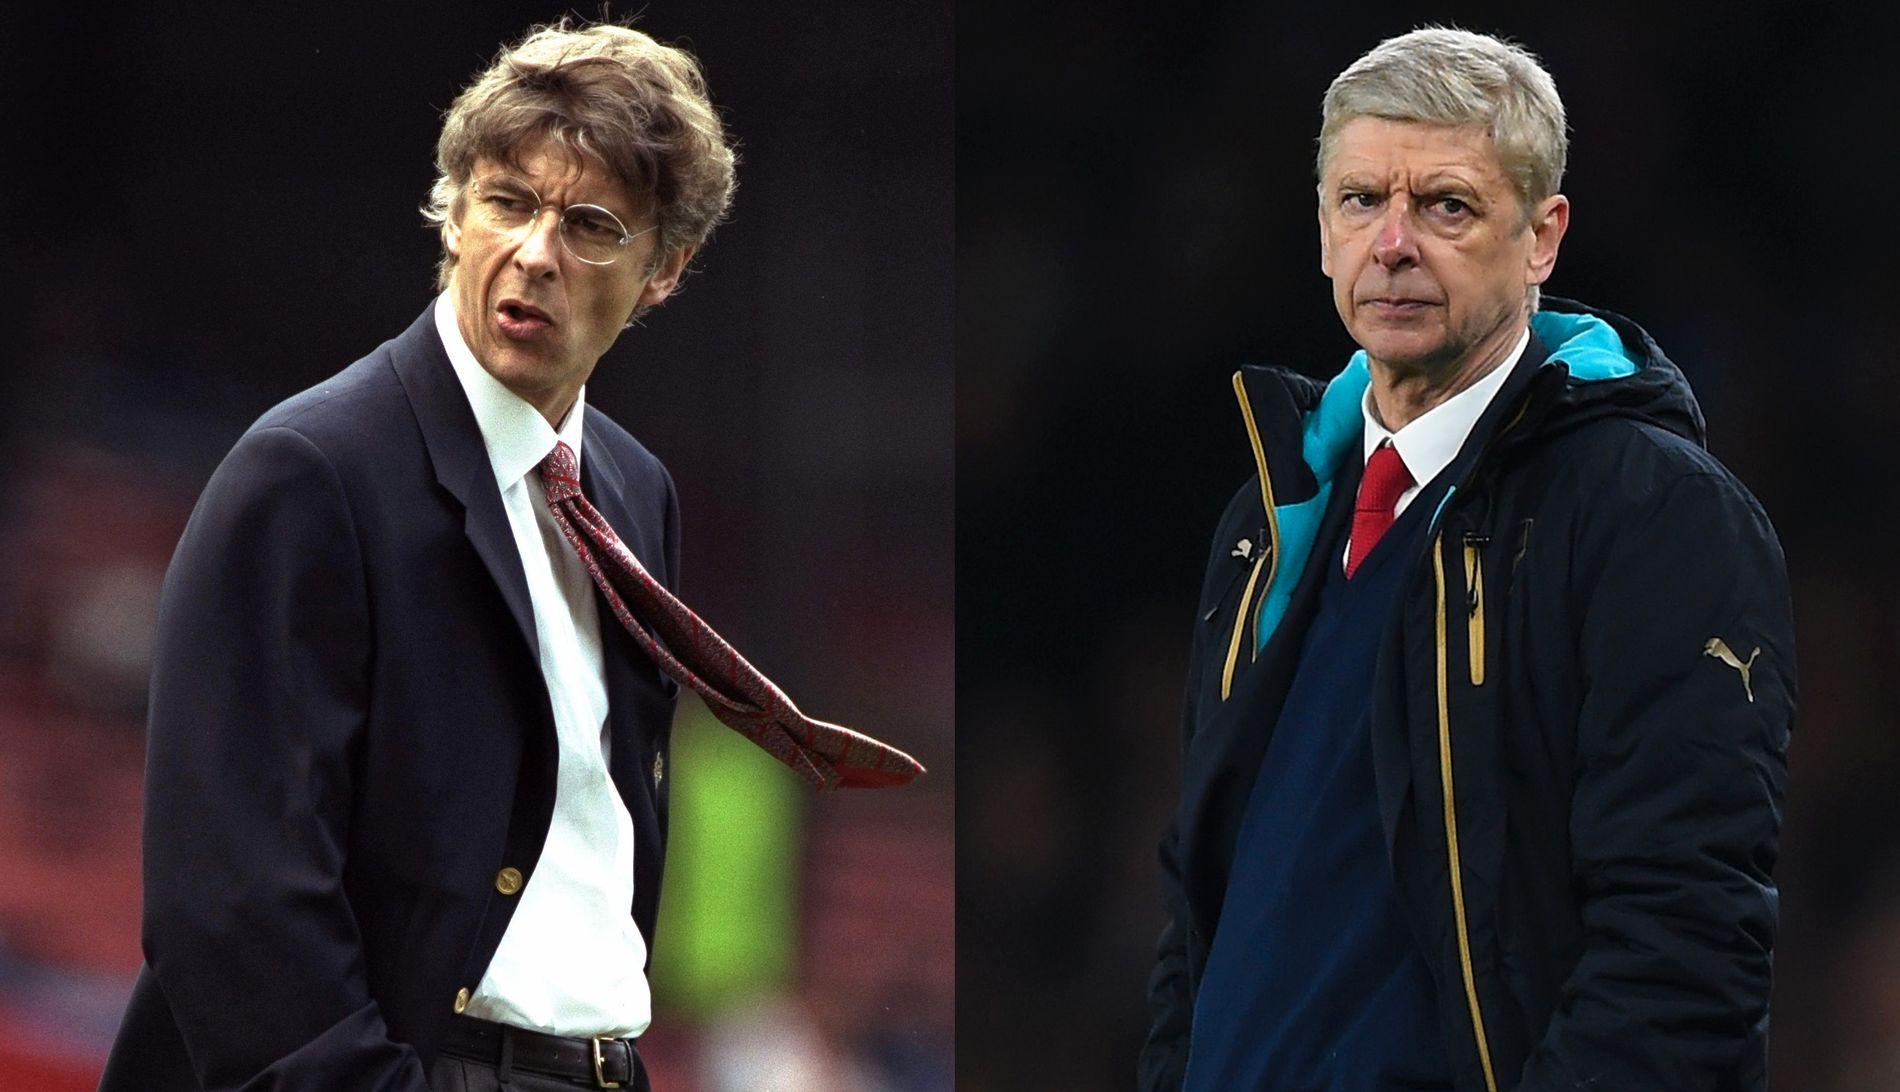 DA OG NÅ: Arséne Wenger kom til Arsenal i 1996, og har kontrakt til sommeren 2019.